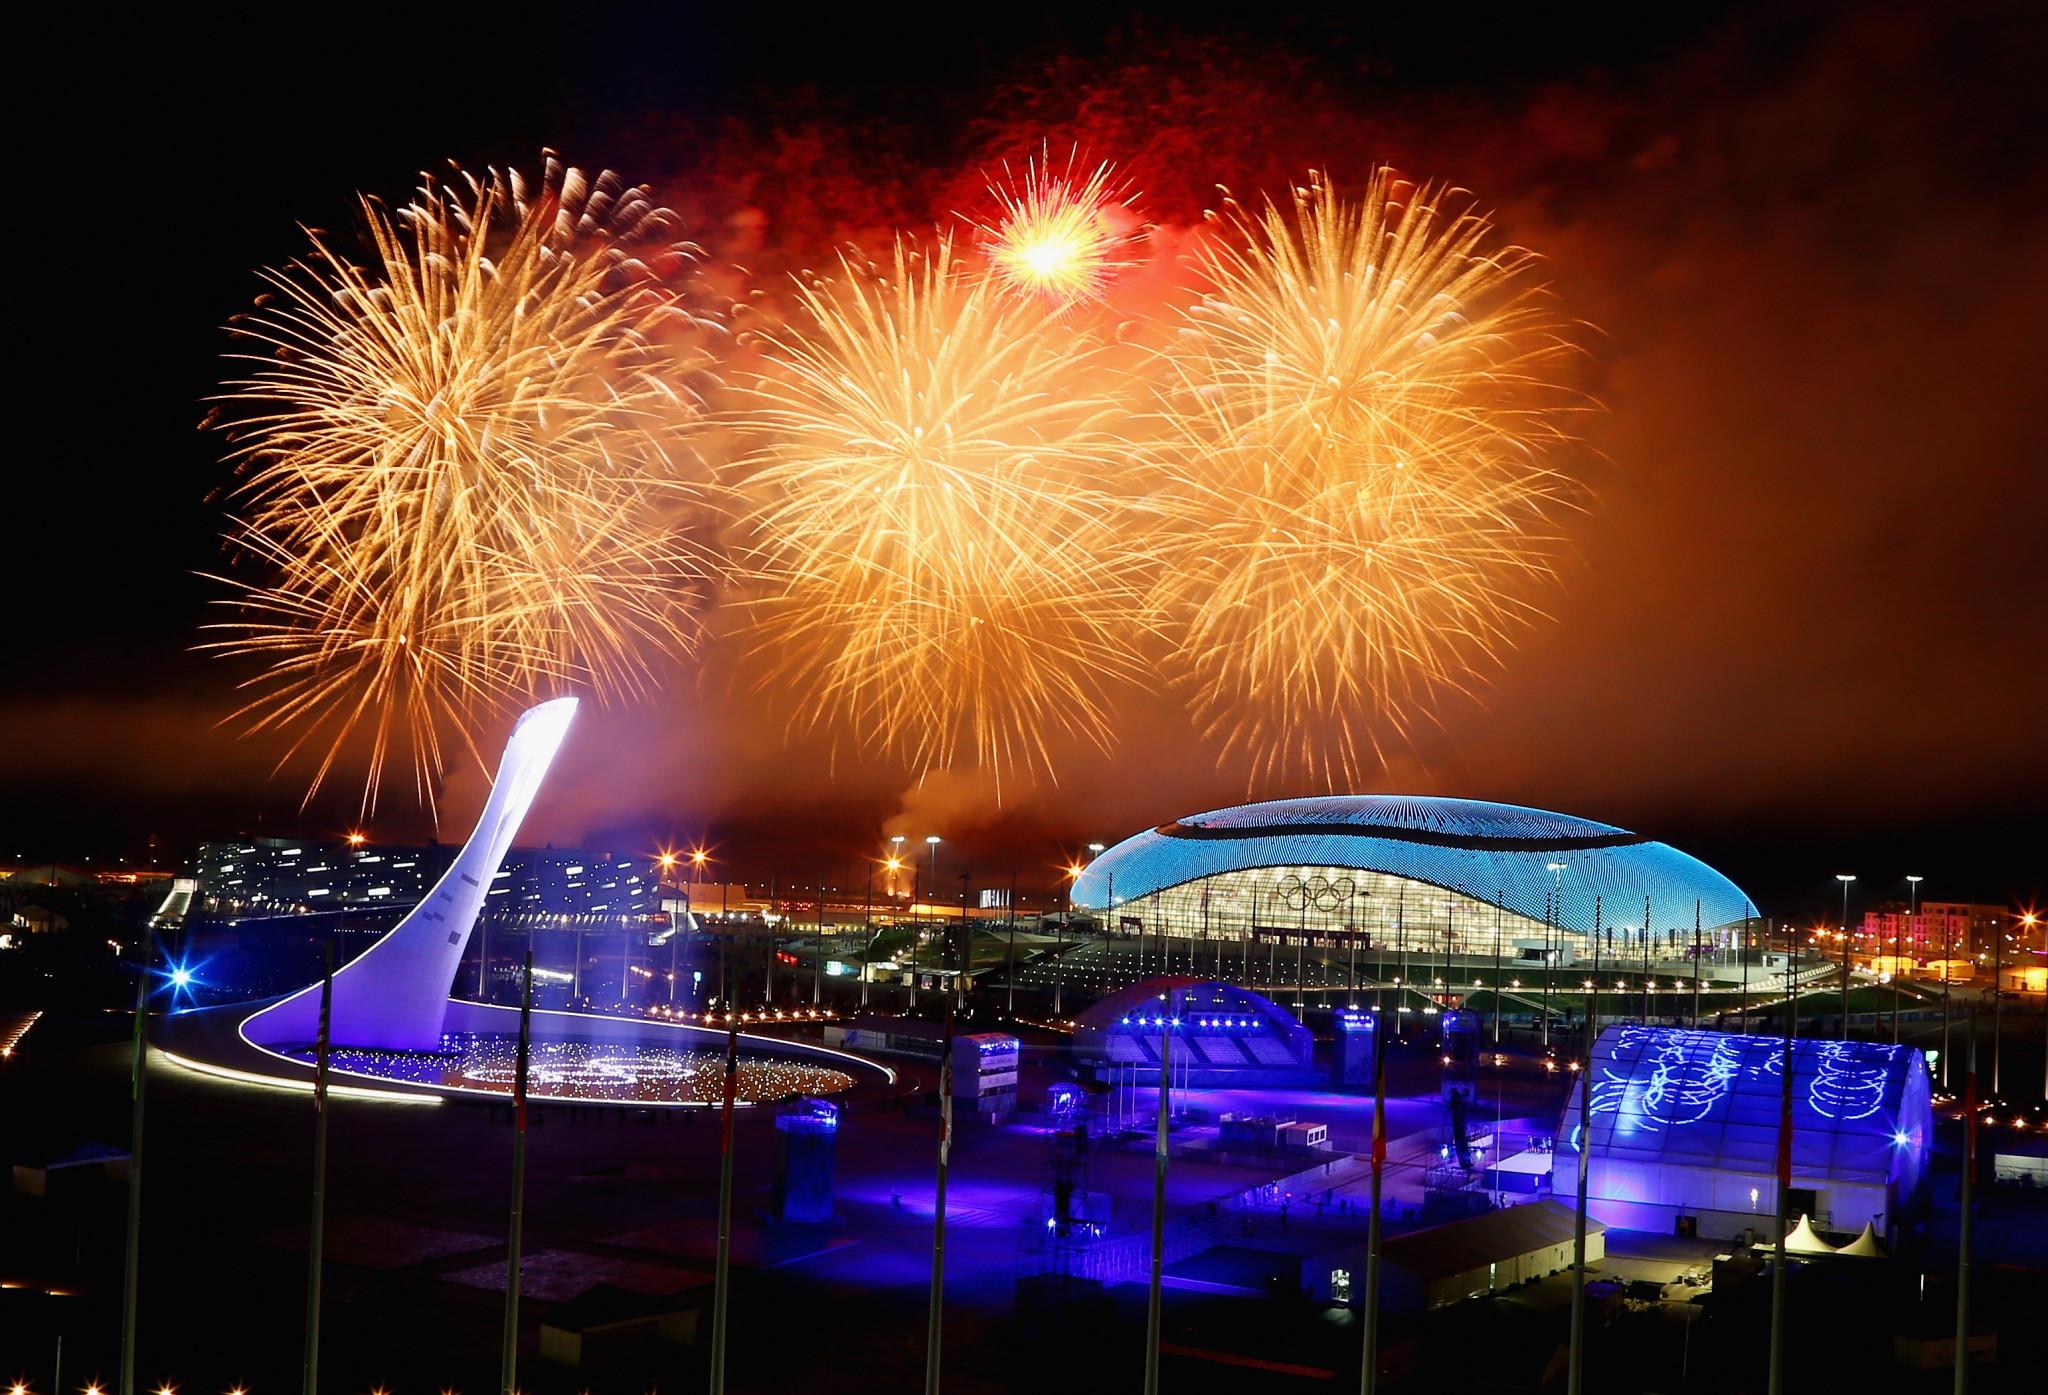 Kremlin claims Sochi 2014 best ever Summer or Winter Olympics despite doping scandal